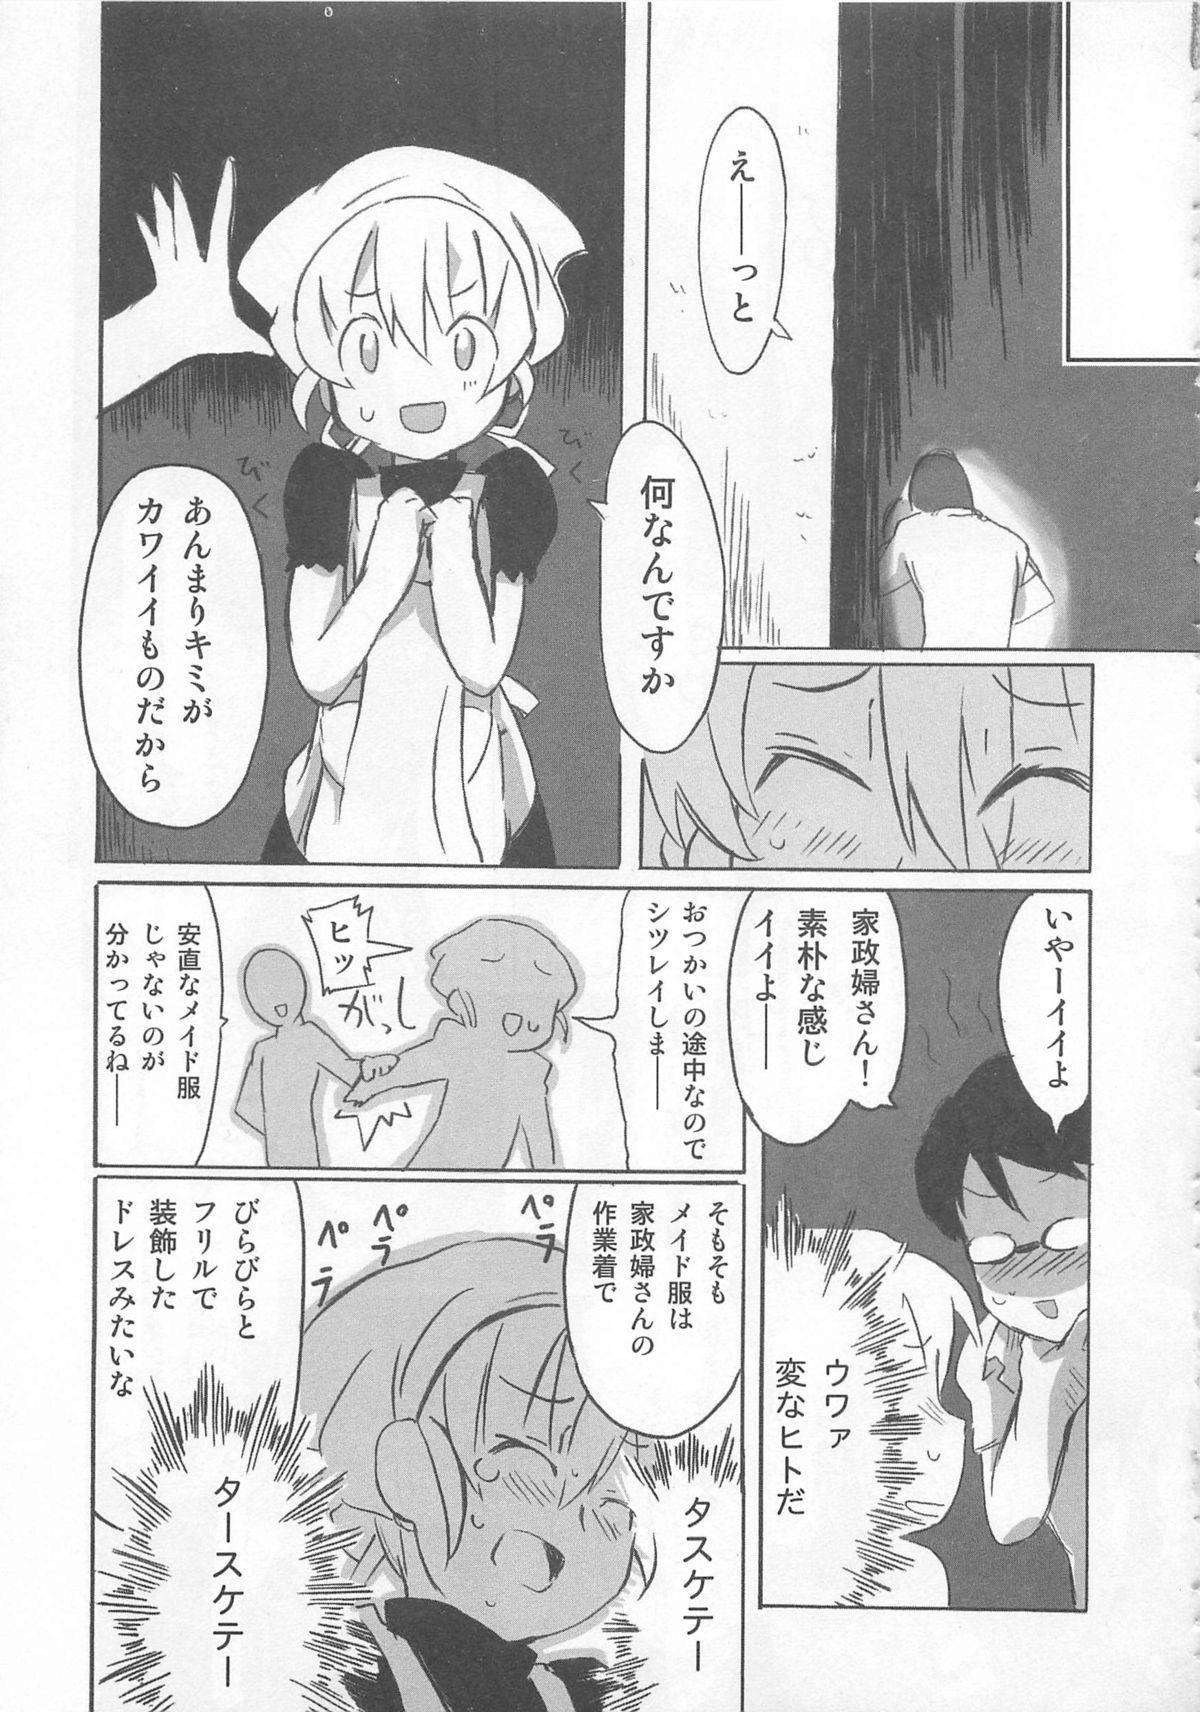 Otokonoko HEAVEN Vol. 02 Dokidoki Chikan Taiken 49